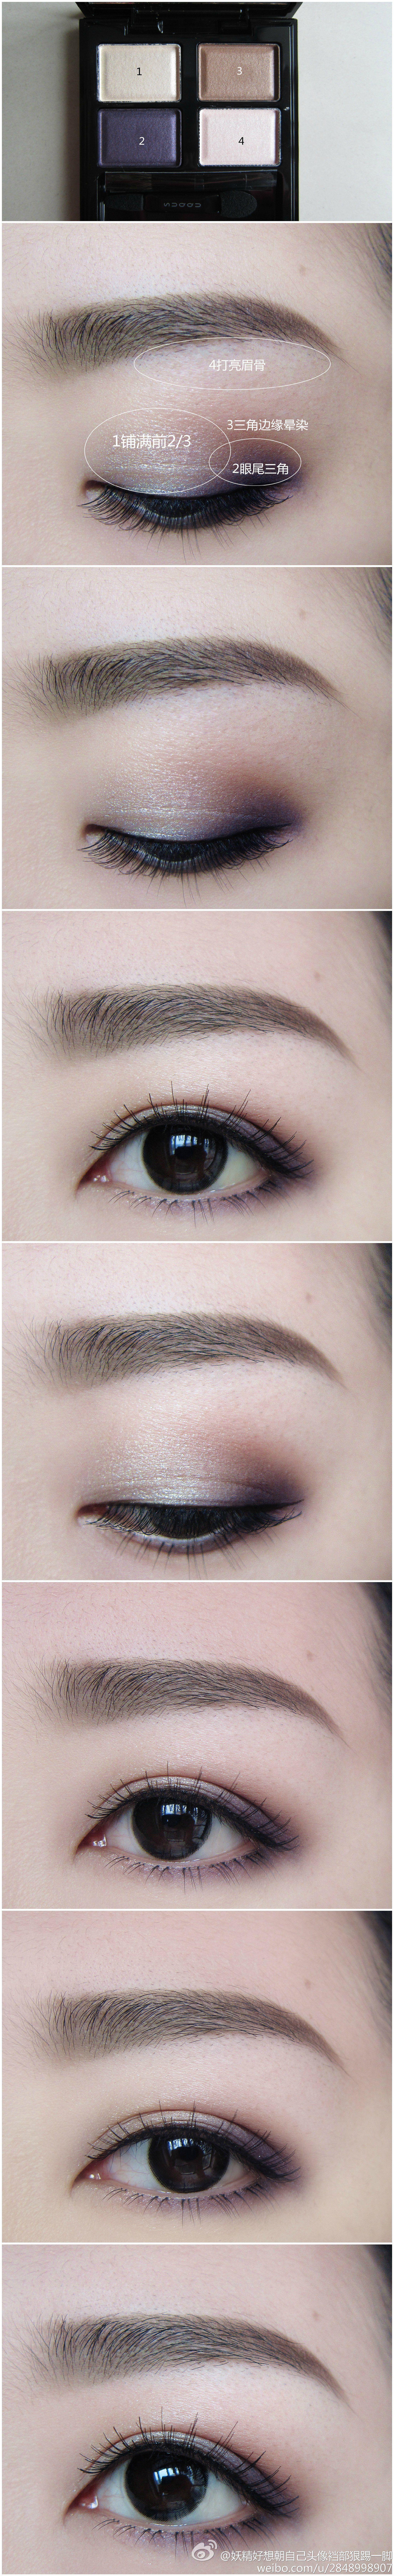 Show You How To Apply Beautiful Purple Smokey Eye Makeup More